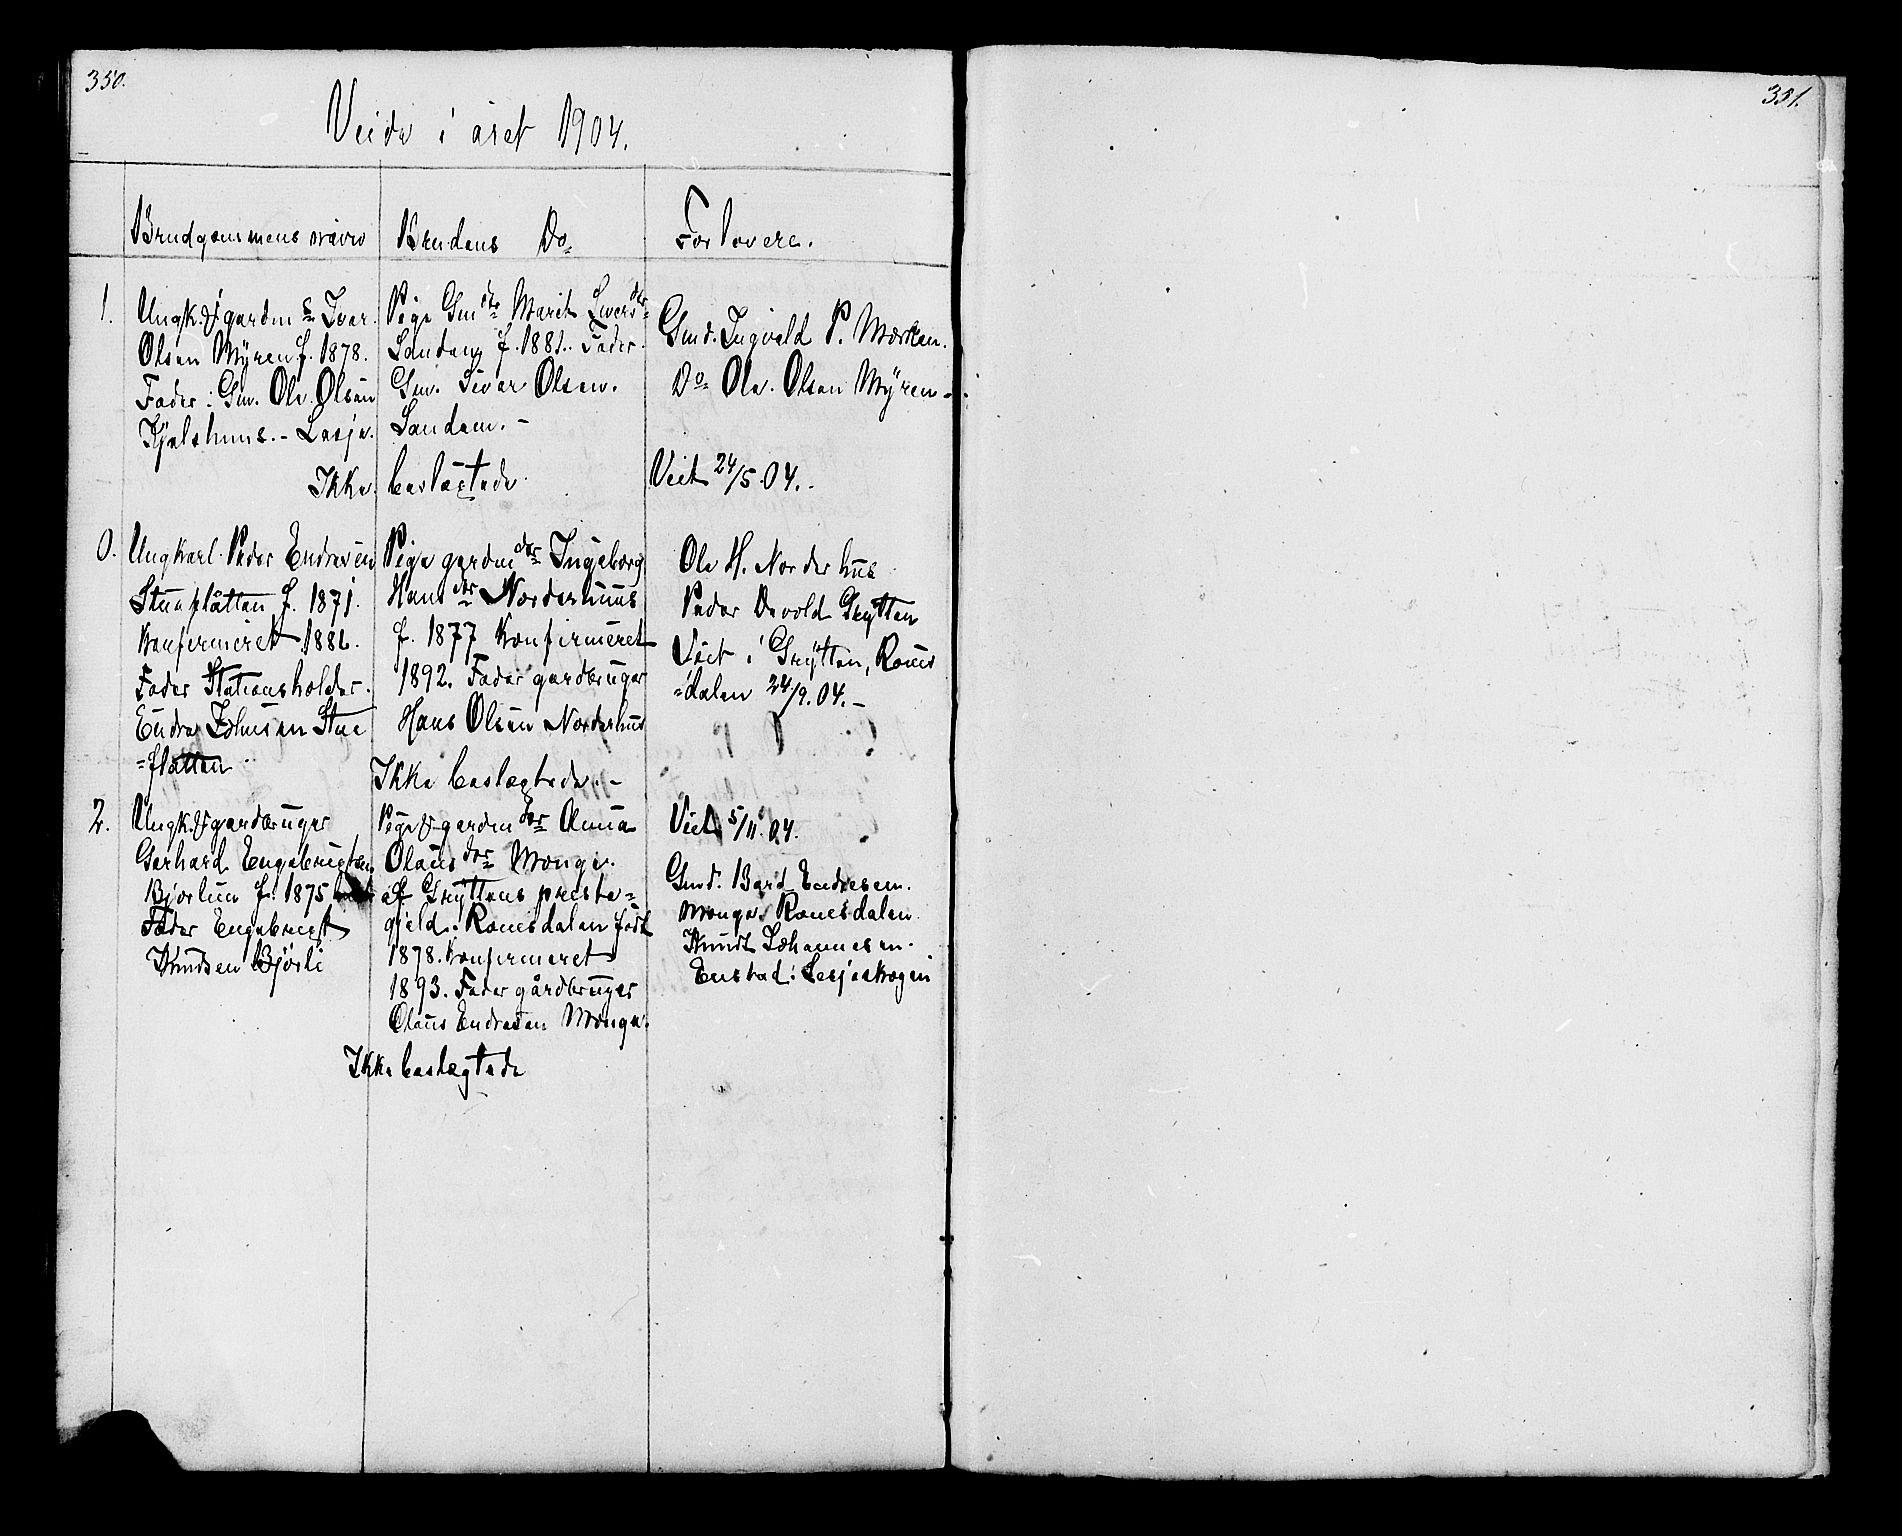 SAH, Lesja prestekontor, Klokkerbok nr. 6, 1871-1904, s. 350-351